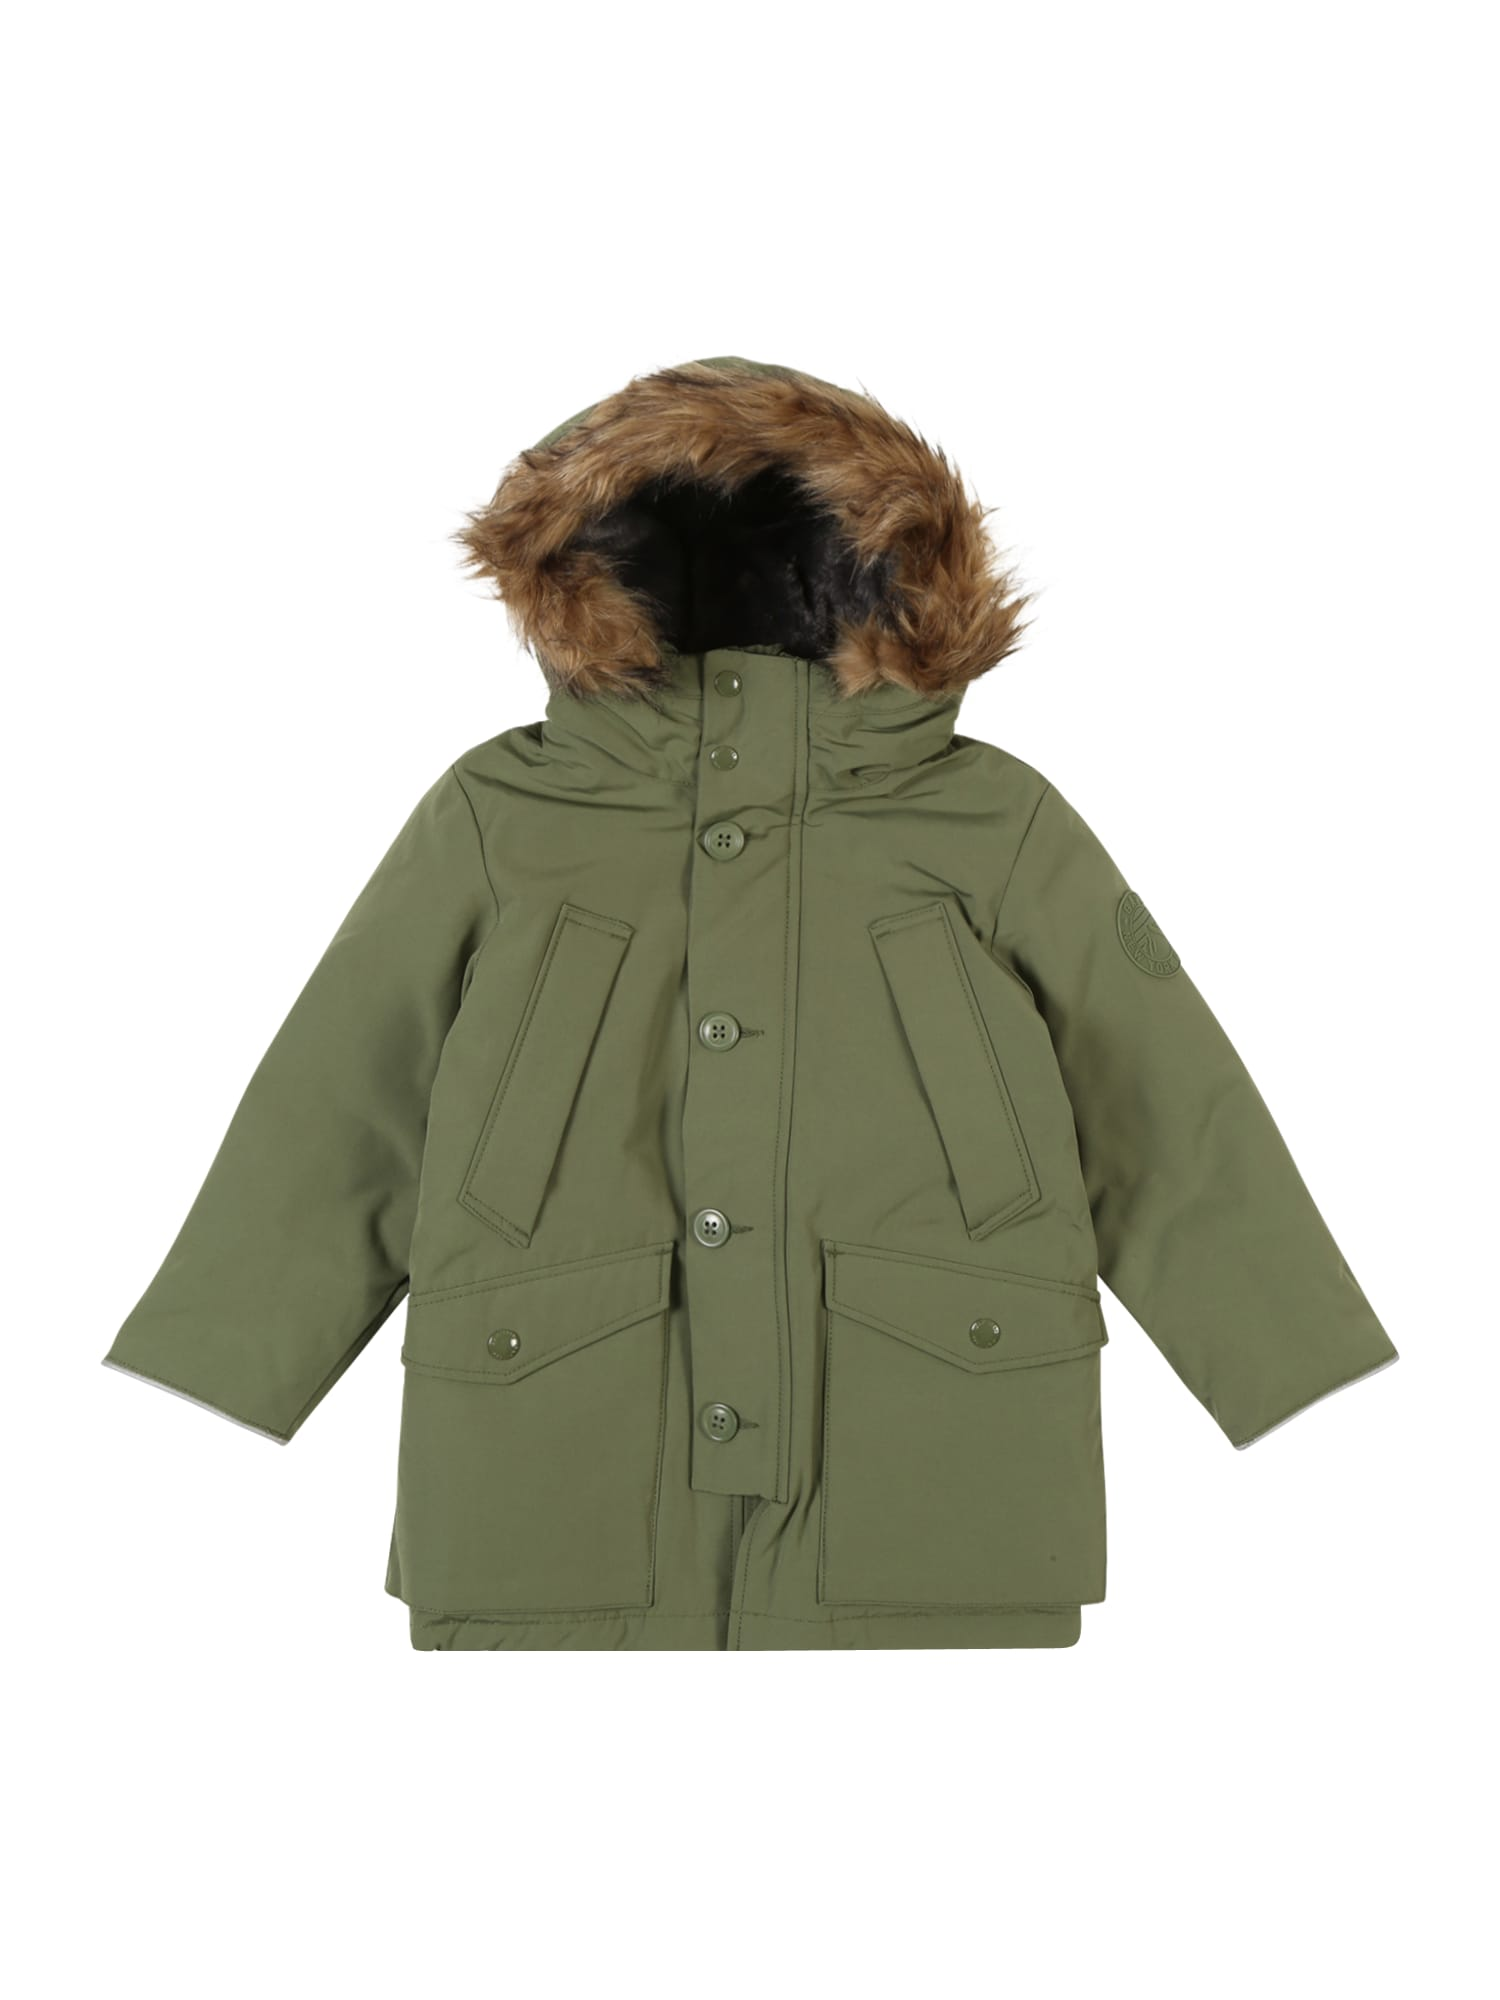 GAP Žieminė striukė 'WARMESTPARKA' žalia